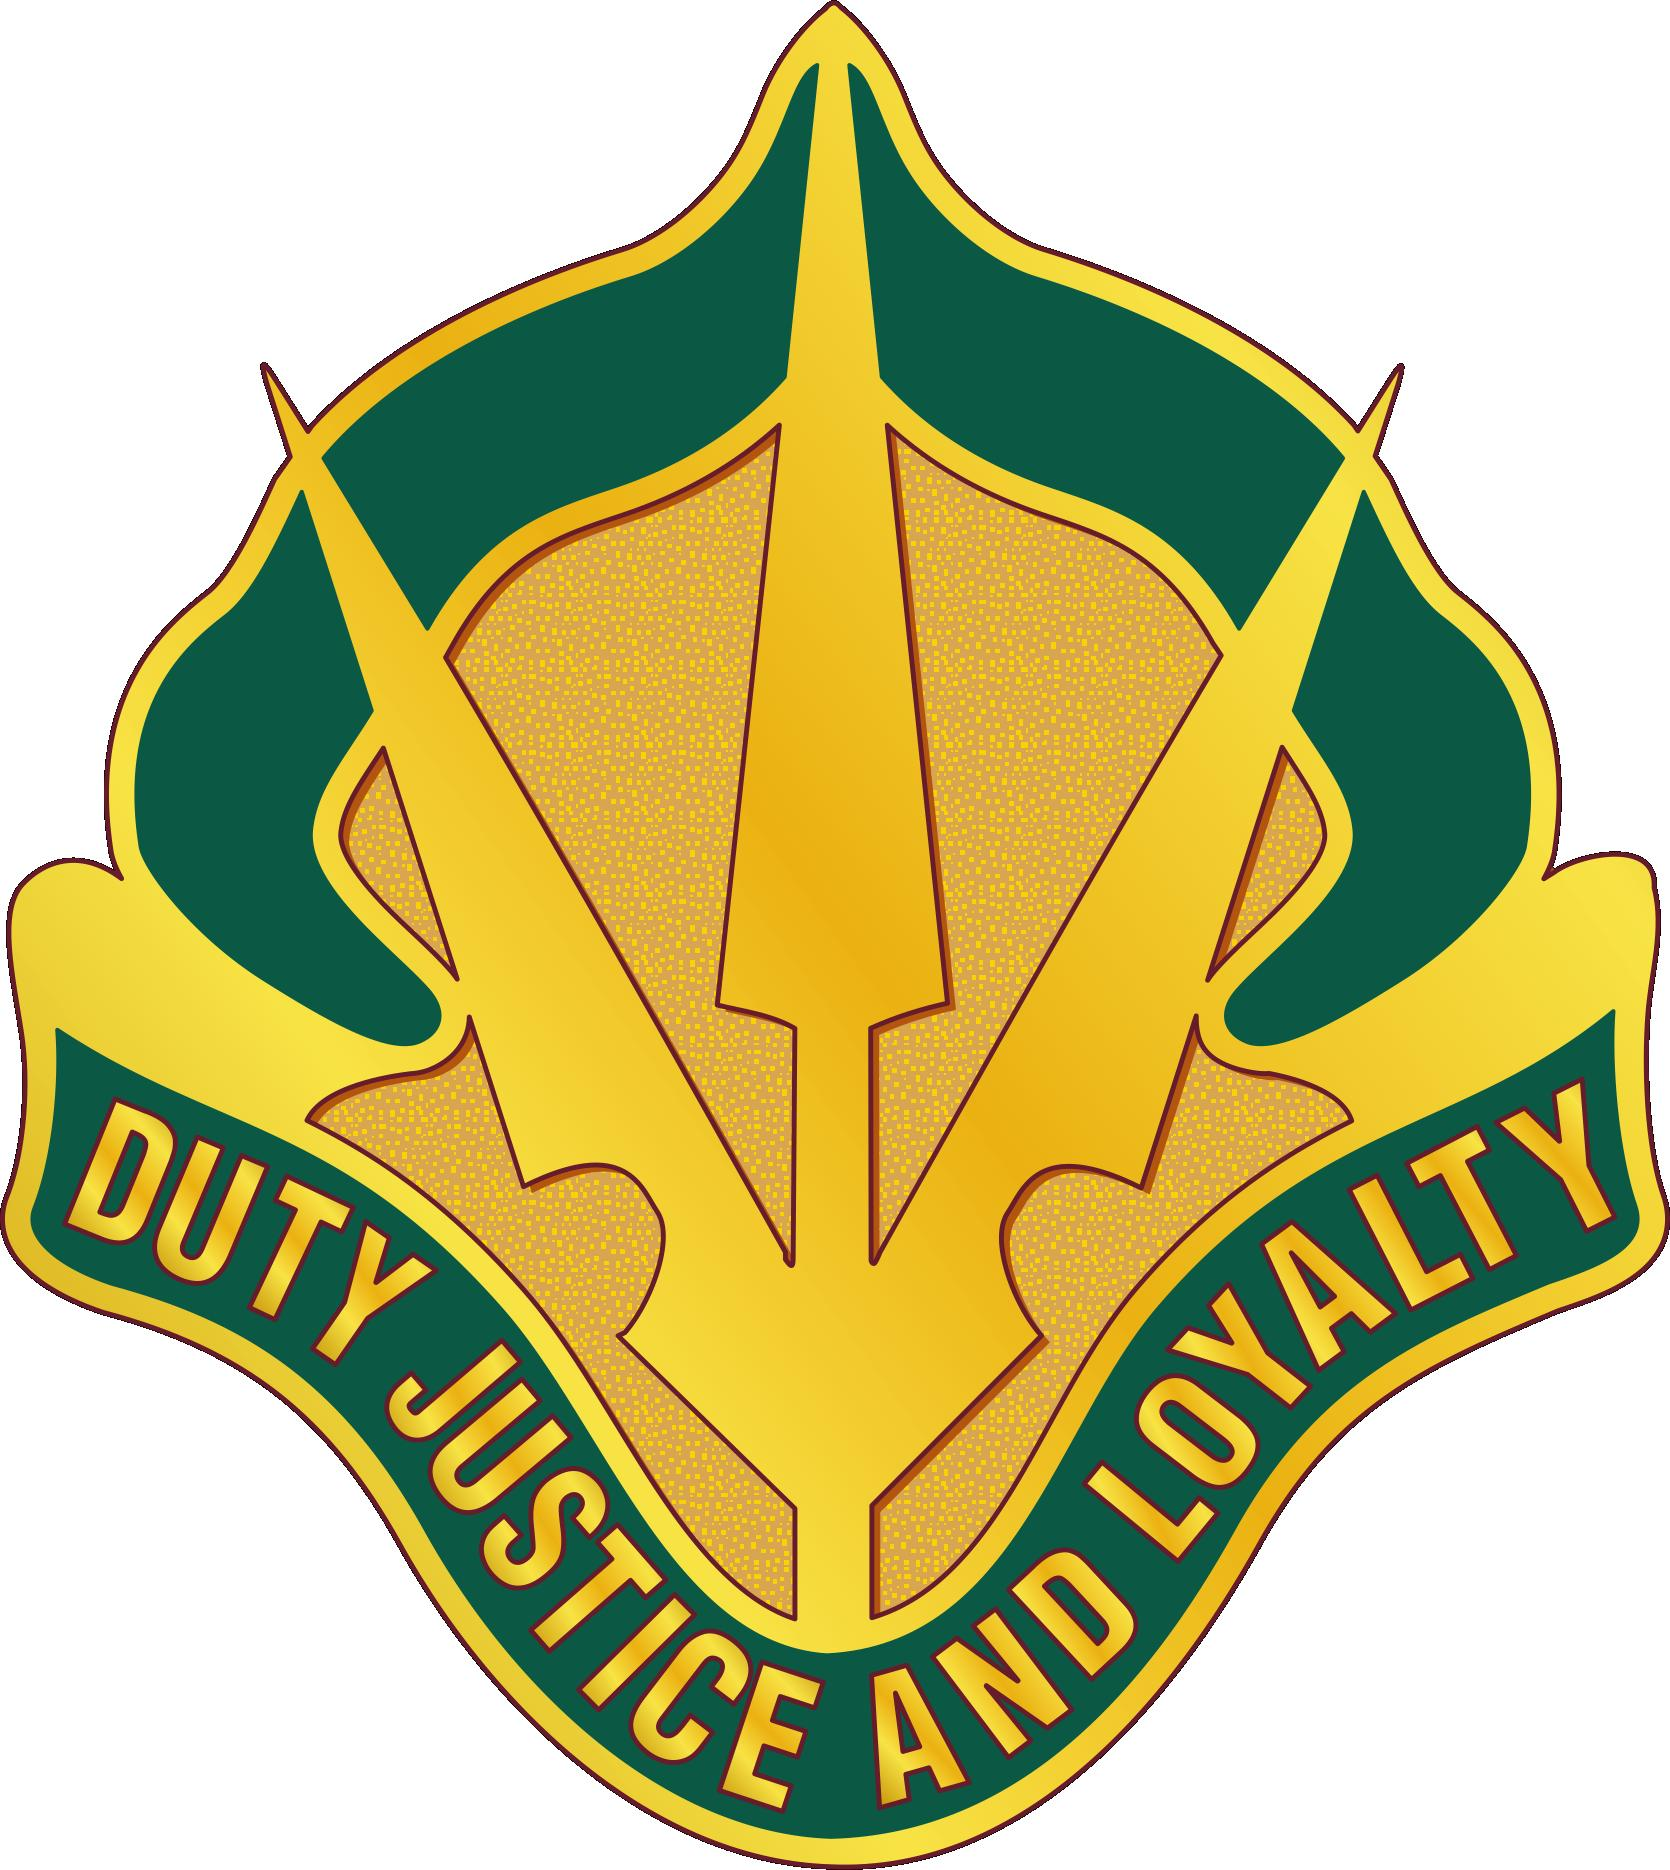 US ARMY 49 MILITARY POLICE BRIGADE UNIT CREST